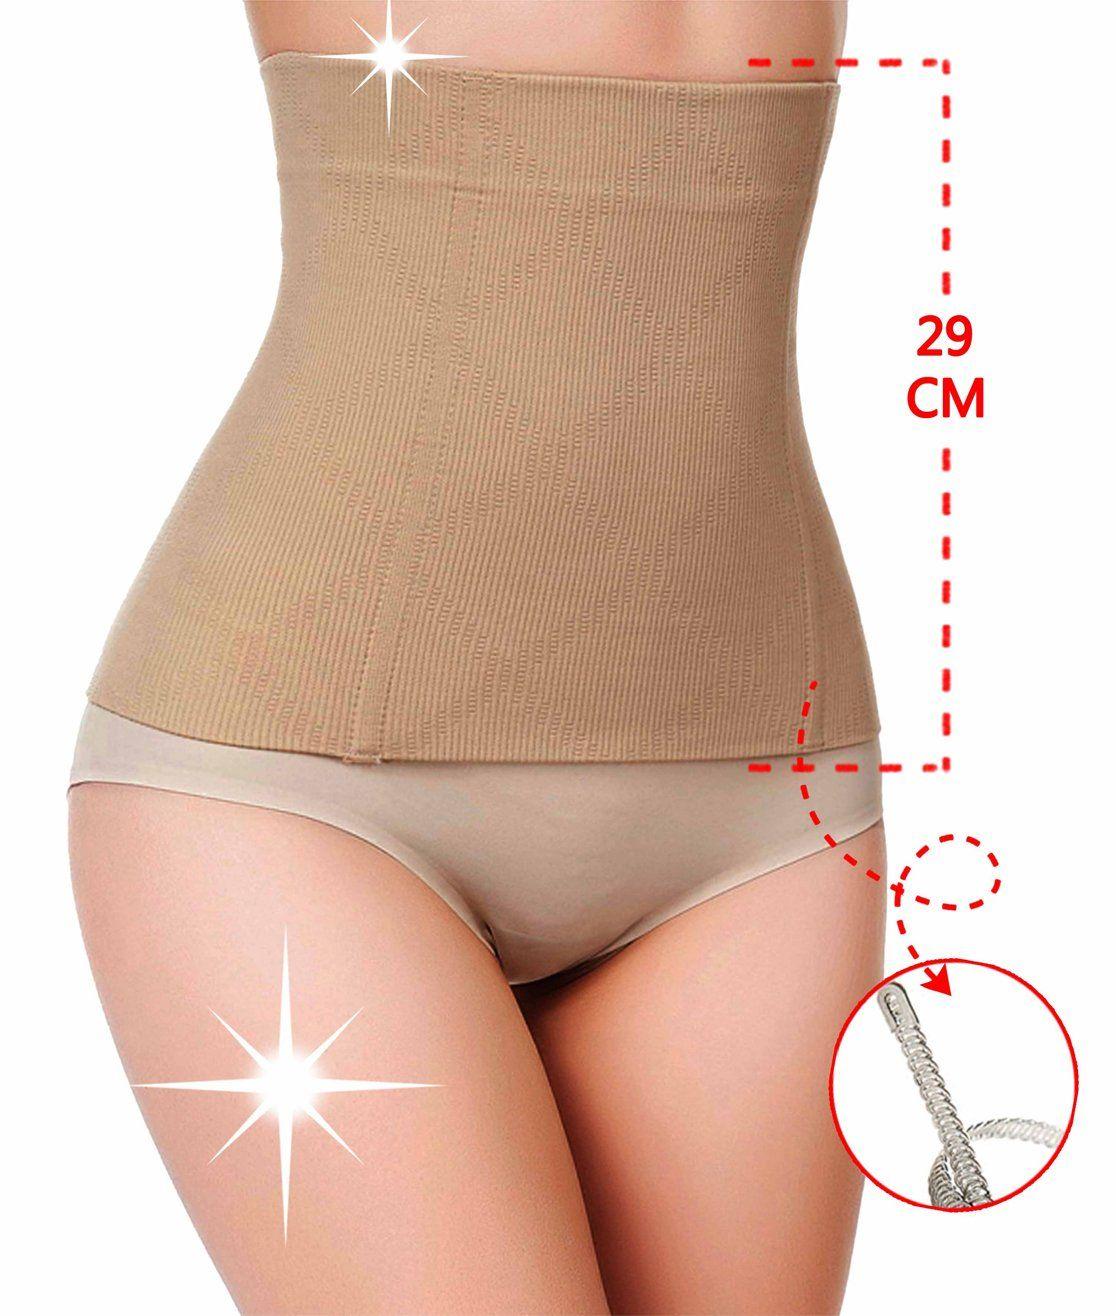 3a3c84f76cd1 waist trainer vest latex corset long torso for women men for weight loss  (XL,